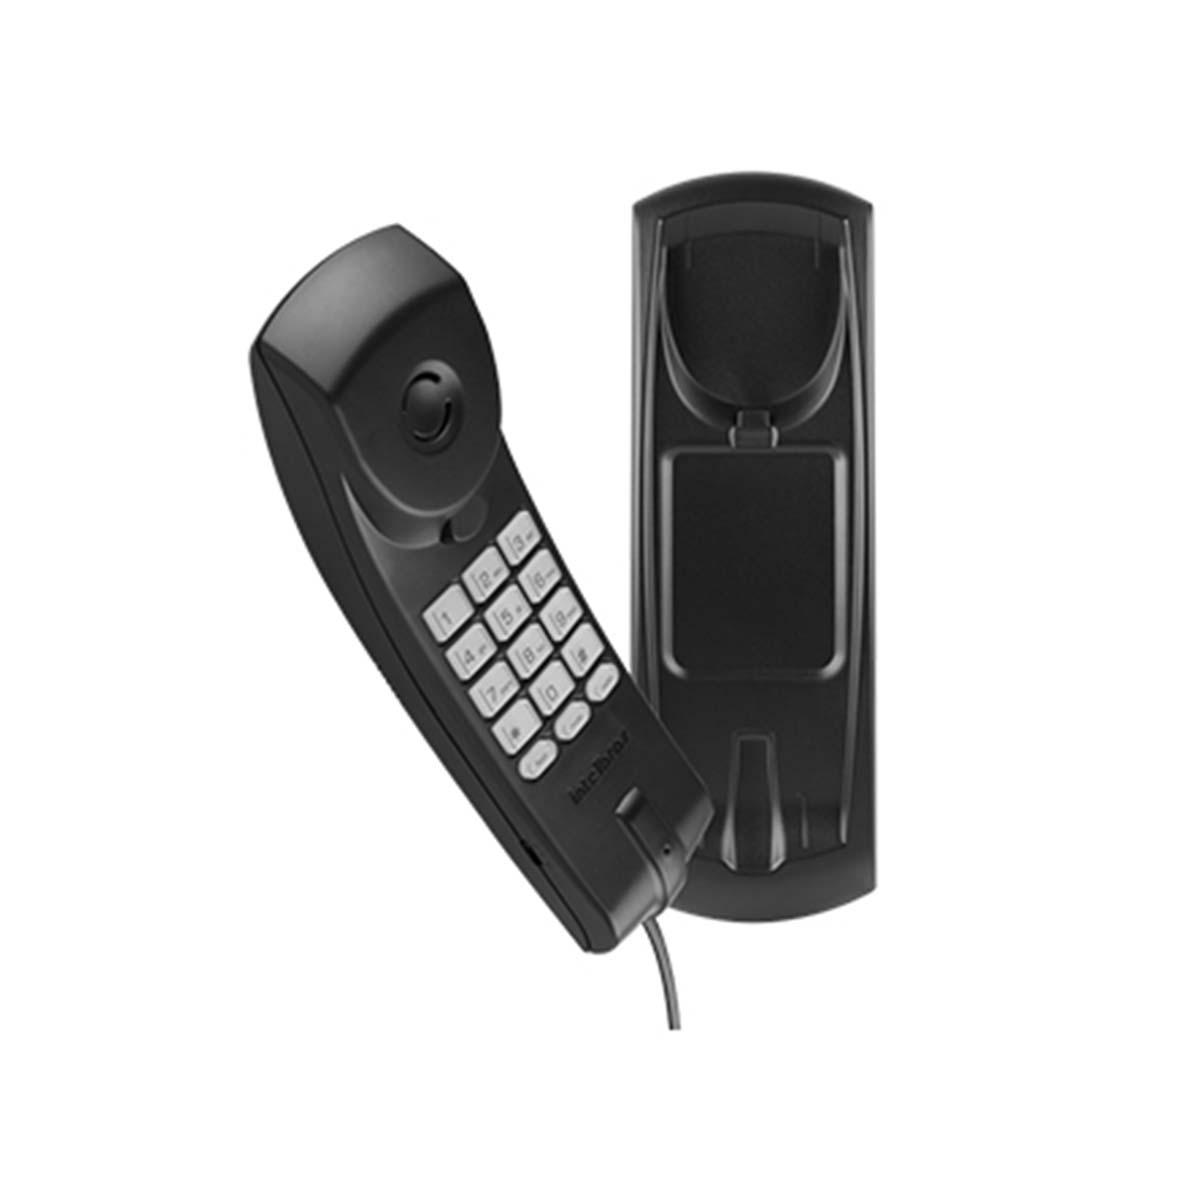 Kit 09 Telefone Intelbras Com Fio Gondola Tc20 Preto